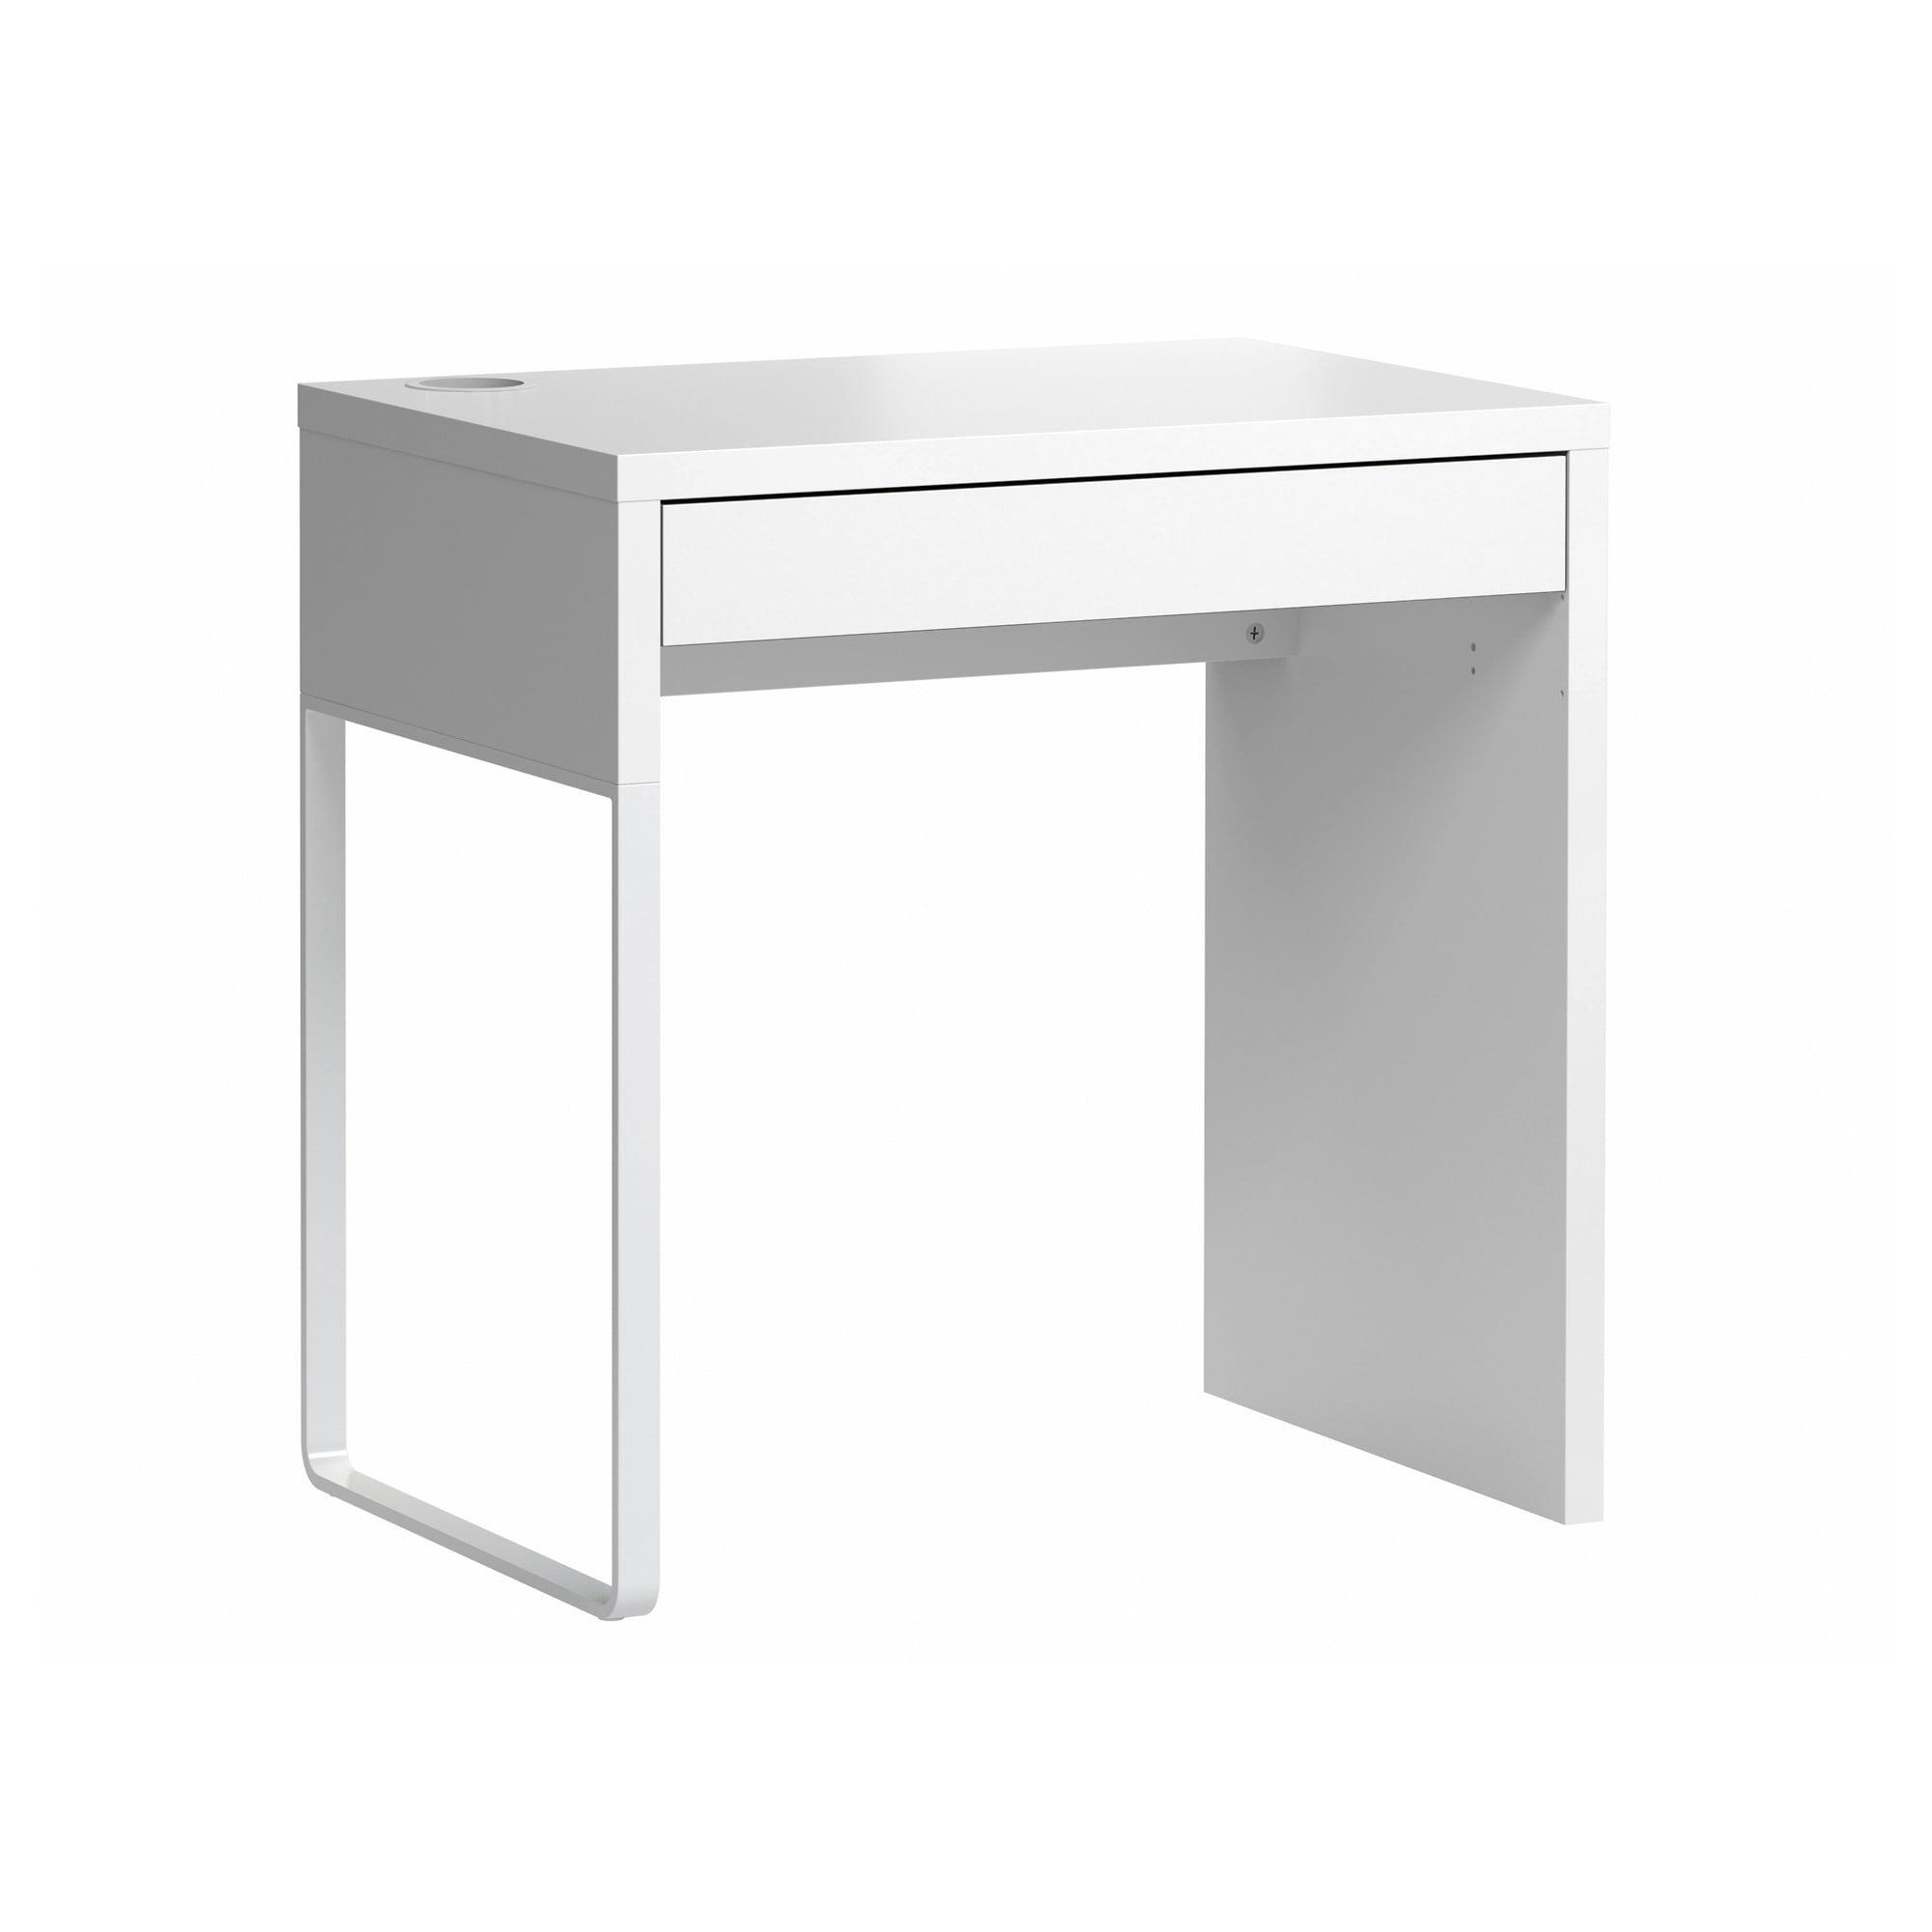 Mesas De Estudio Ikea S5d8 Micke Escritorio Blanco 73 X 50 Cm Ikea